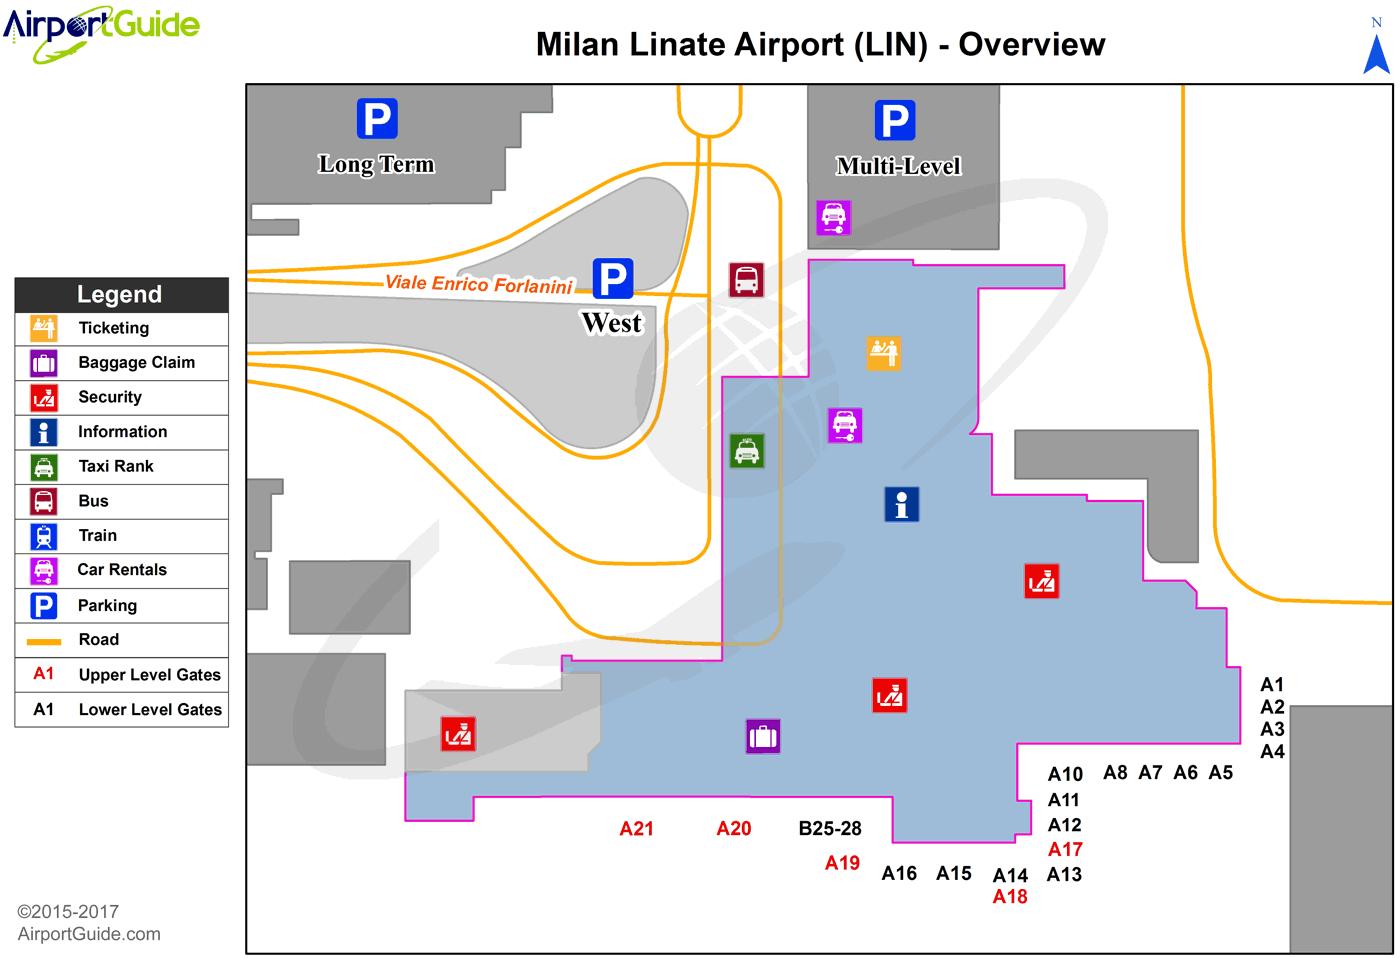 Dulles Airport Parking Guide: Find Convenient Parking Near IAD